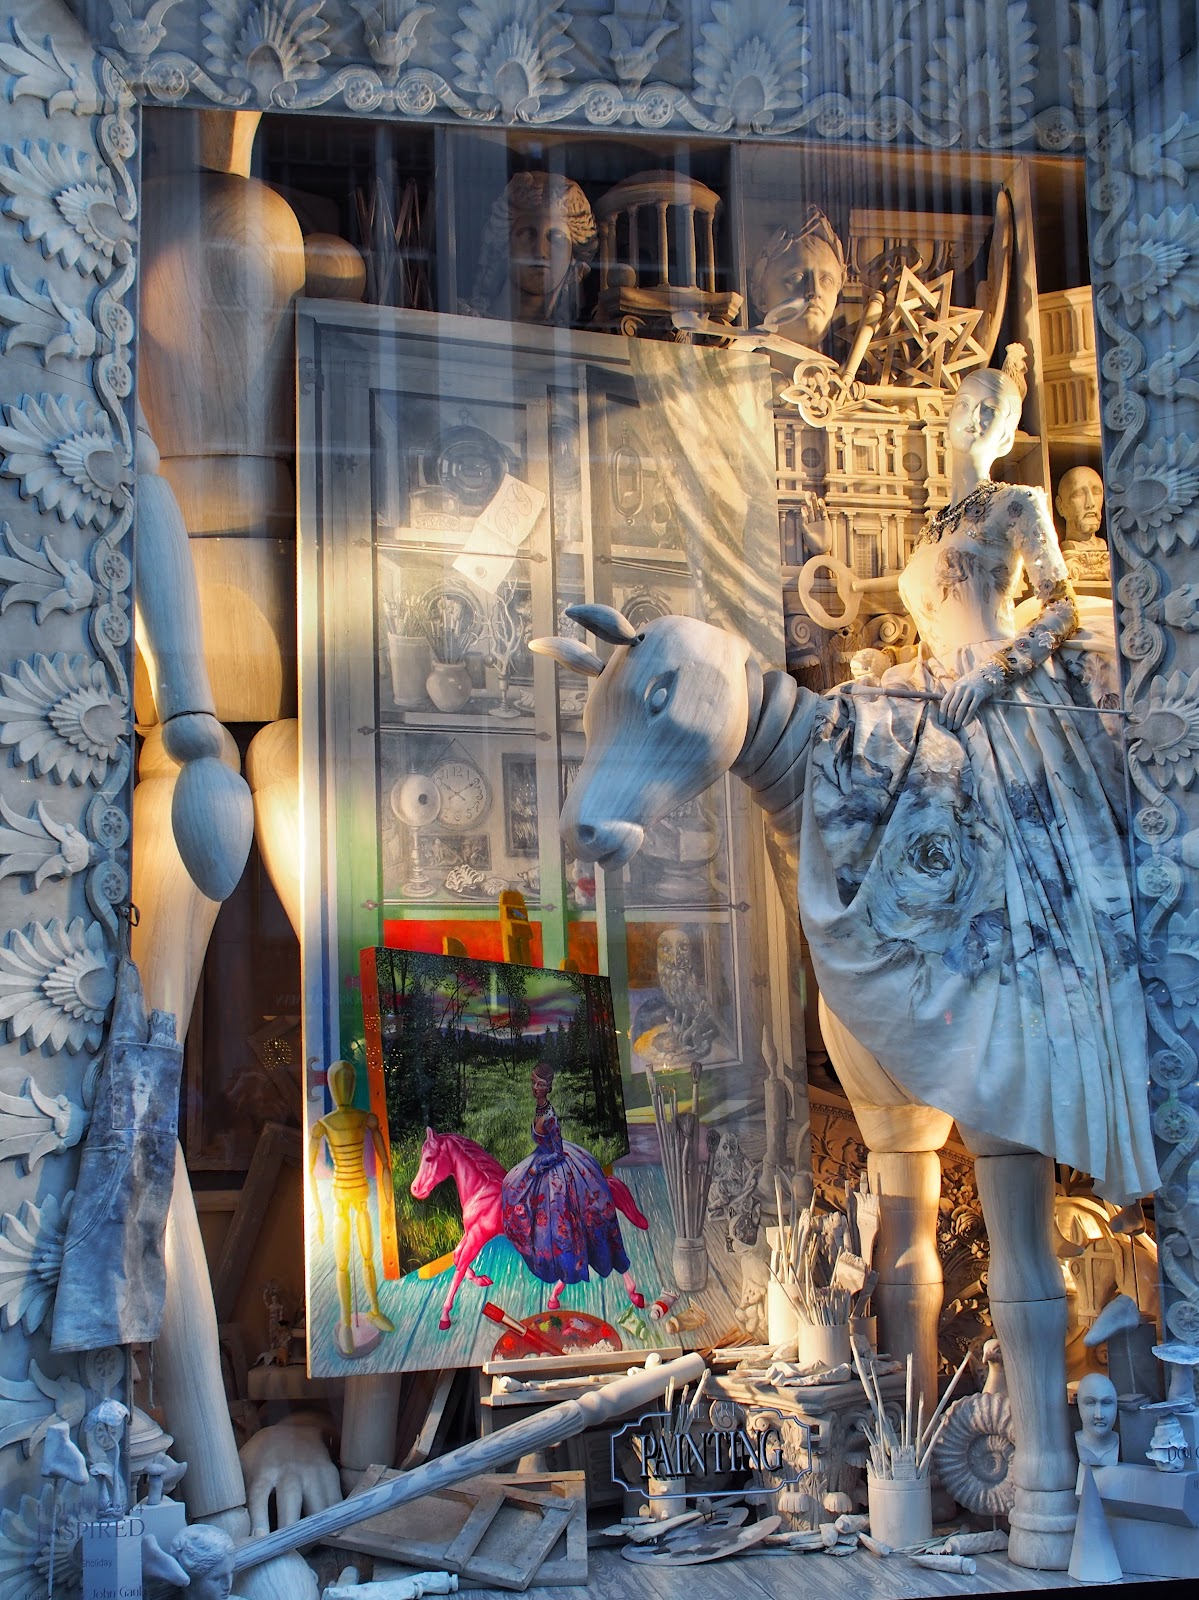 Holding A Pose #HoldingAPose #bgwindows #windowwatchers #holidaywindows #5thavenuewindows #NYC  #holidays #besttimeoftheyear #nyc ©2014 Nancy Lundebjerg